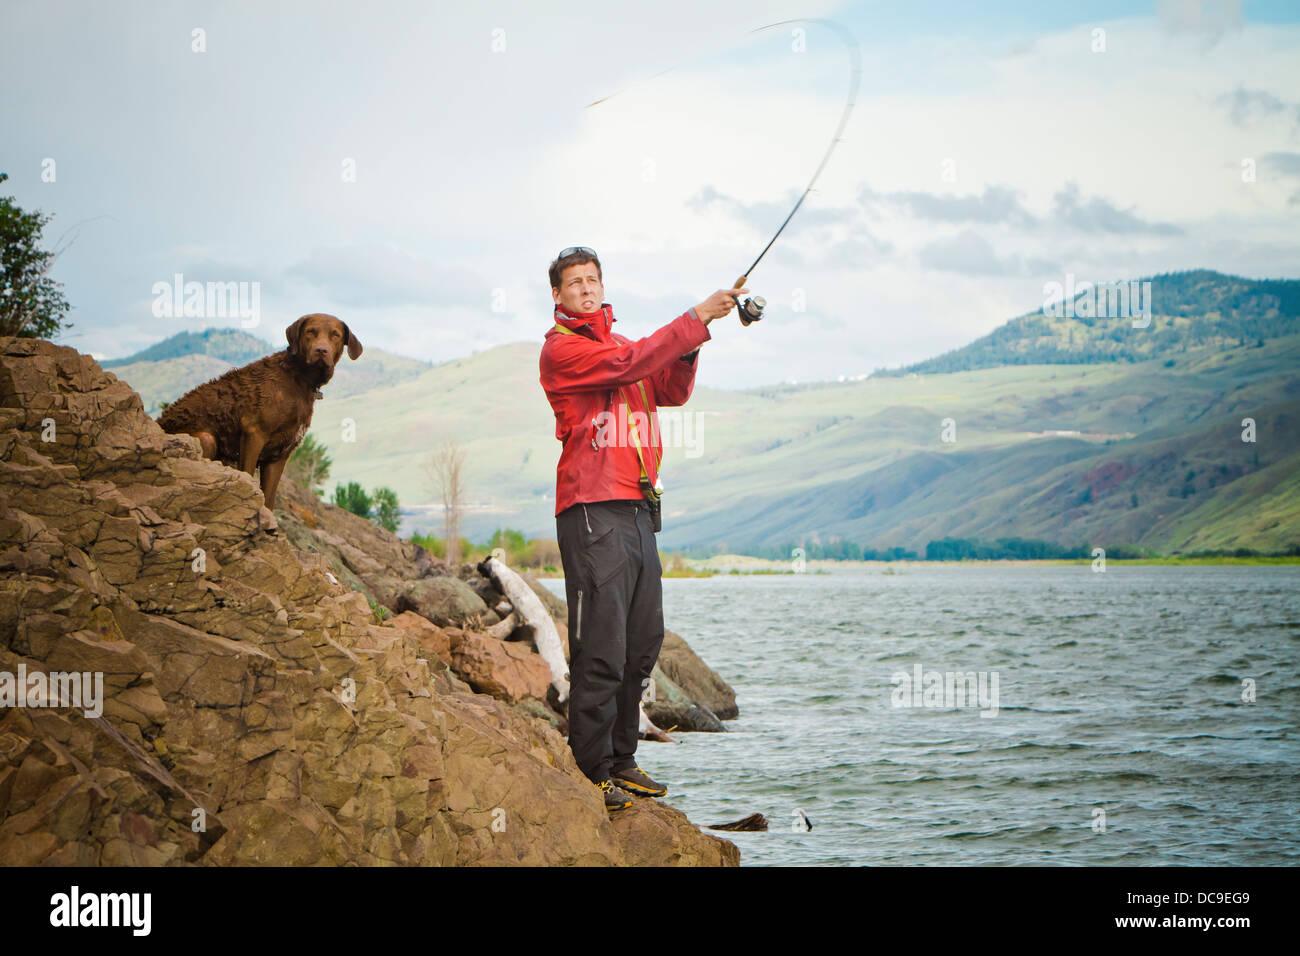 Kamloops Lake - Stock Image